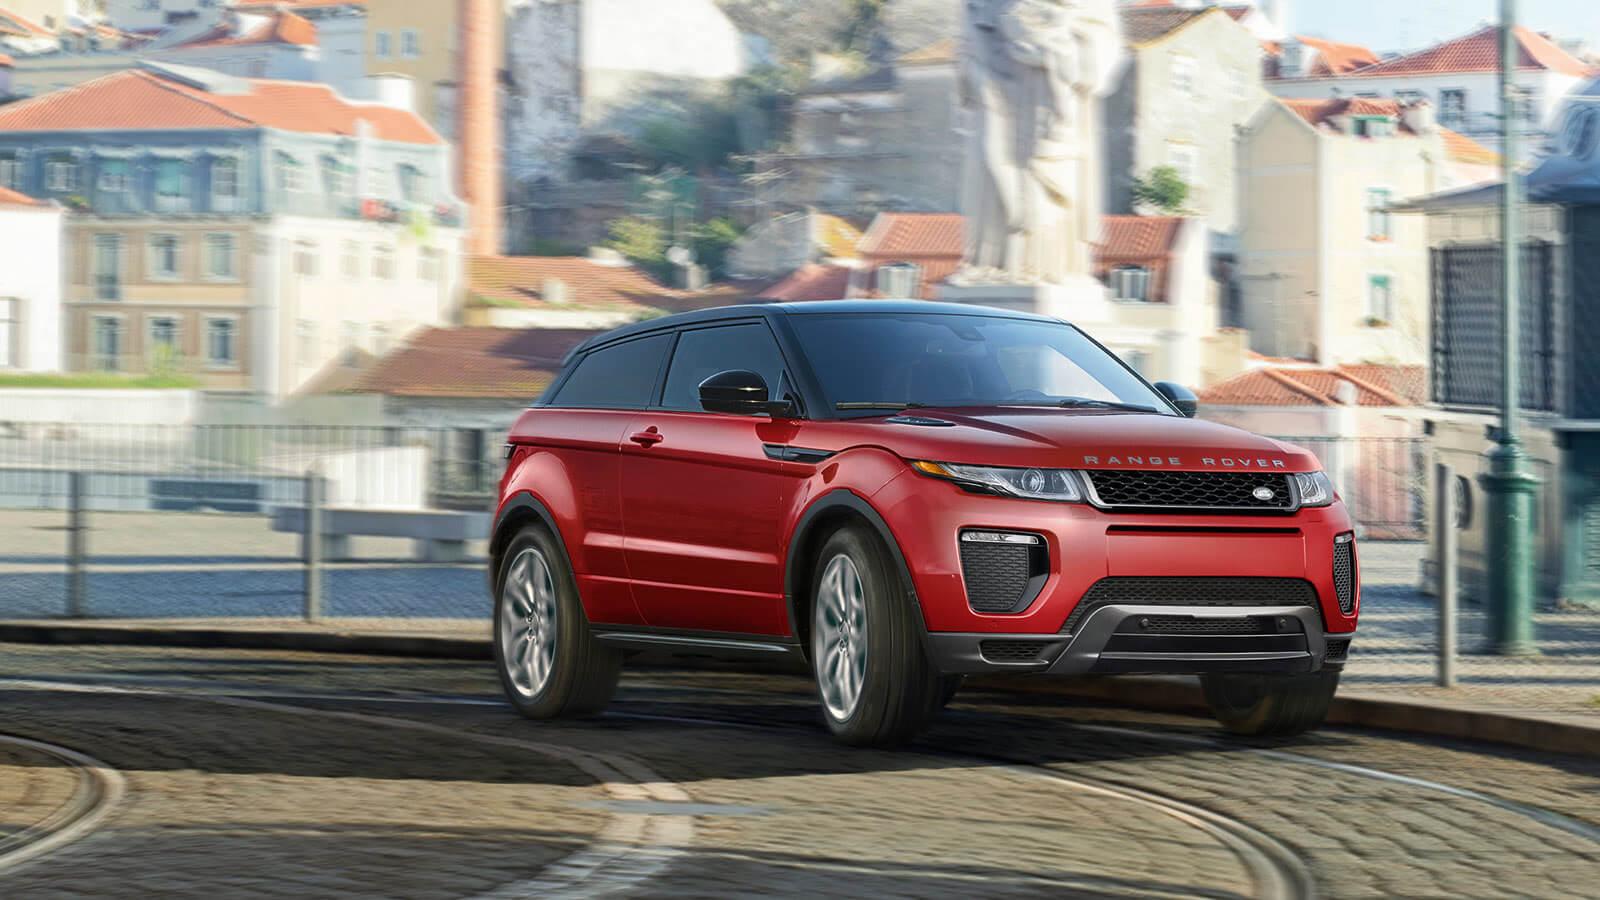 2017 Range Rover Evoque red